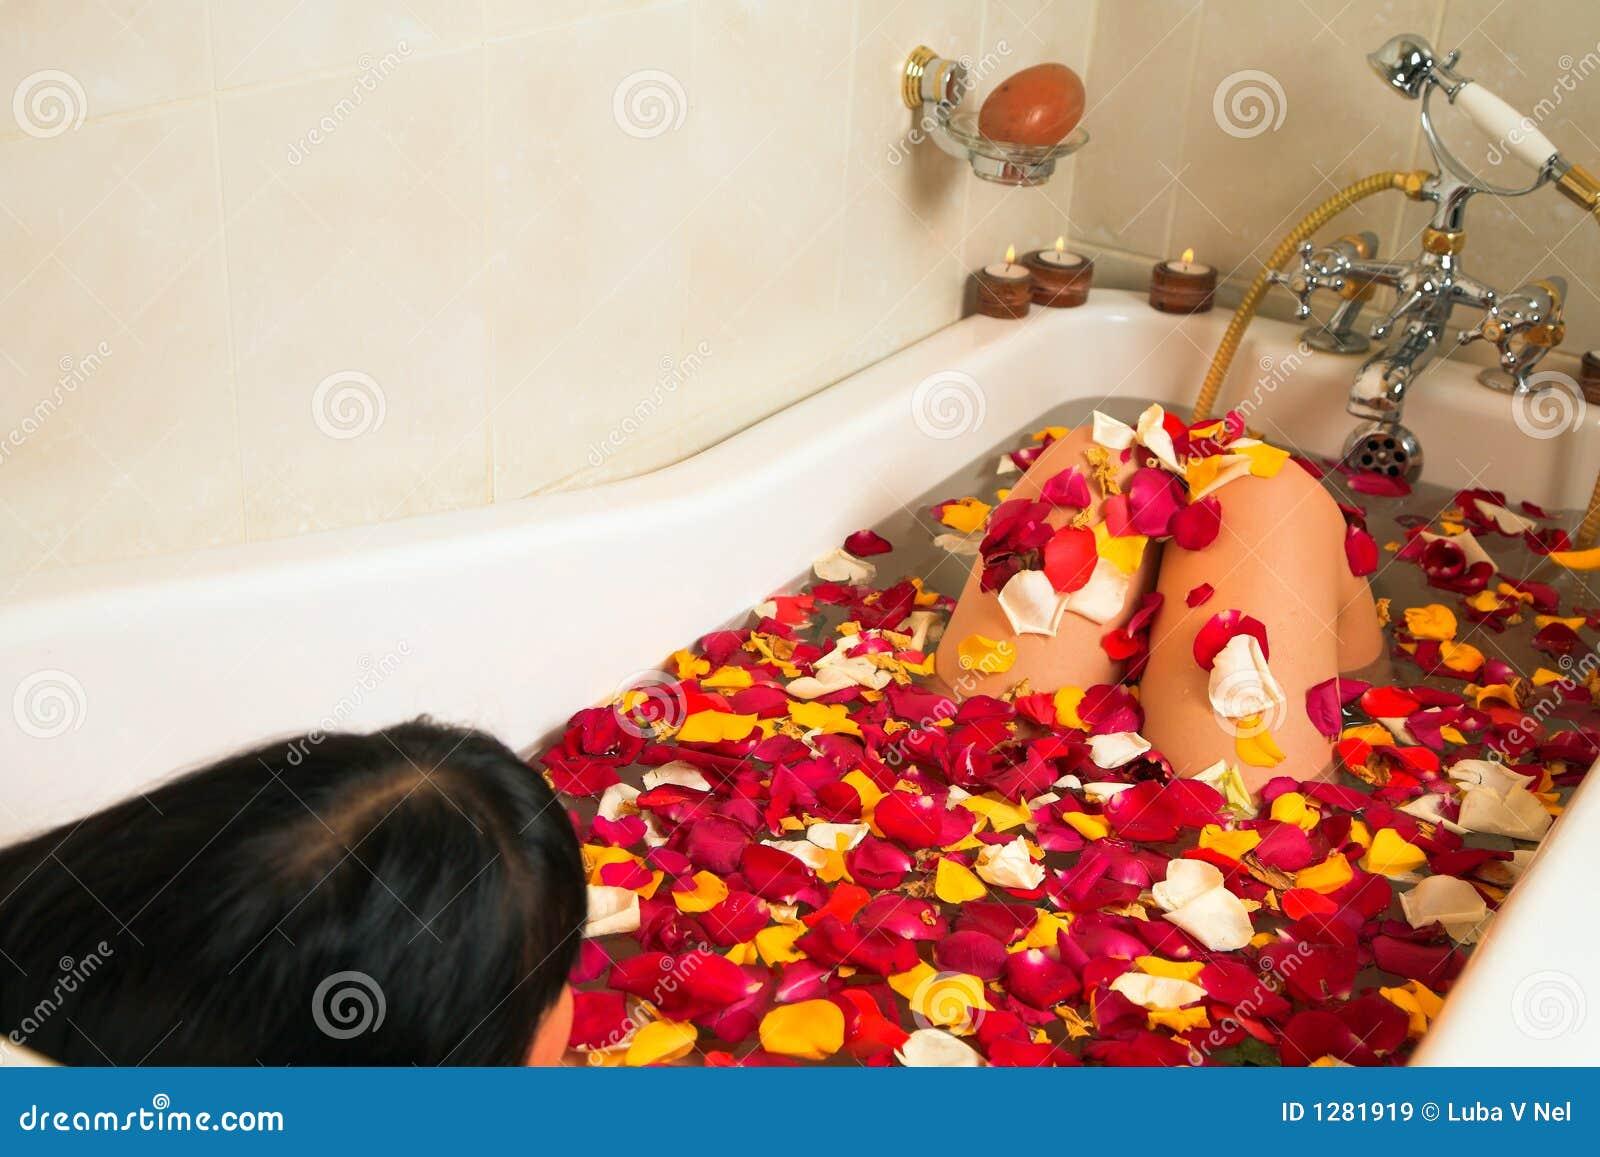 femme dans un bain de p tale de rose image stock image. Black Bedroom Furniture Sets. Home Design Ideas